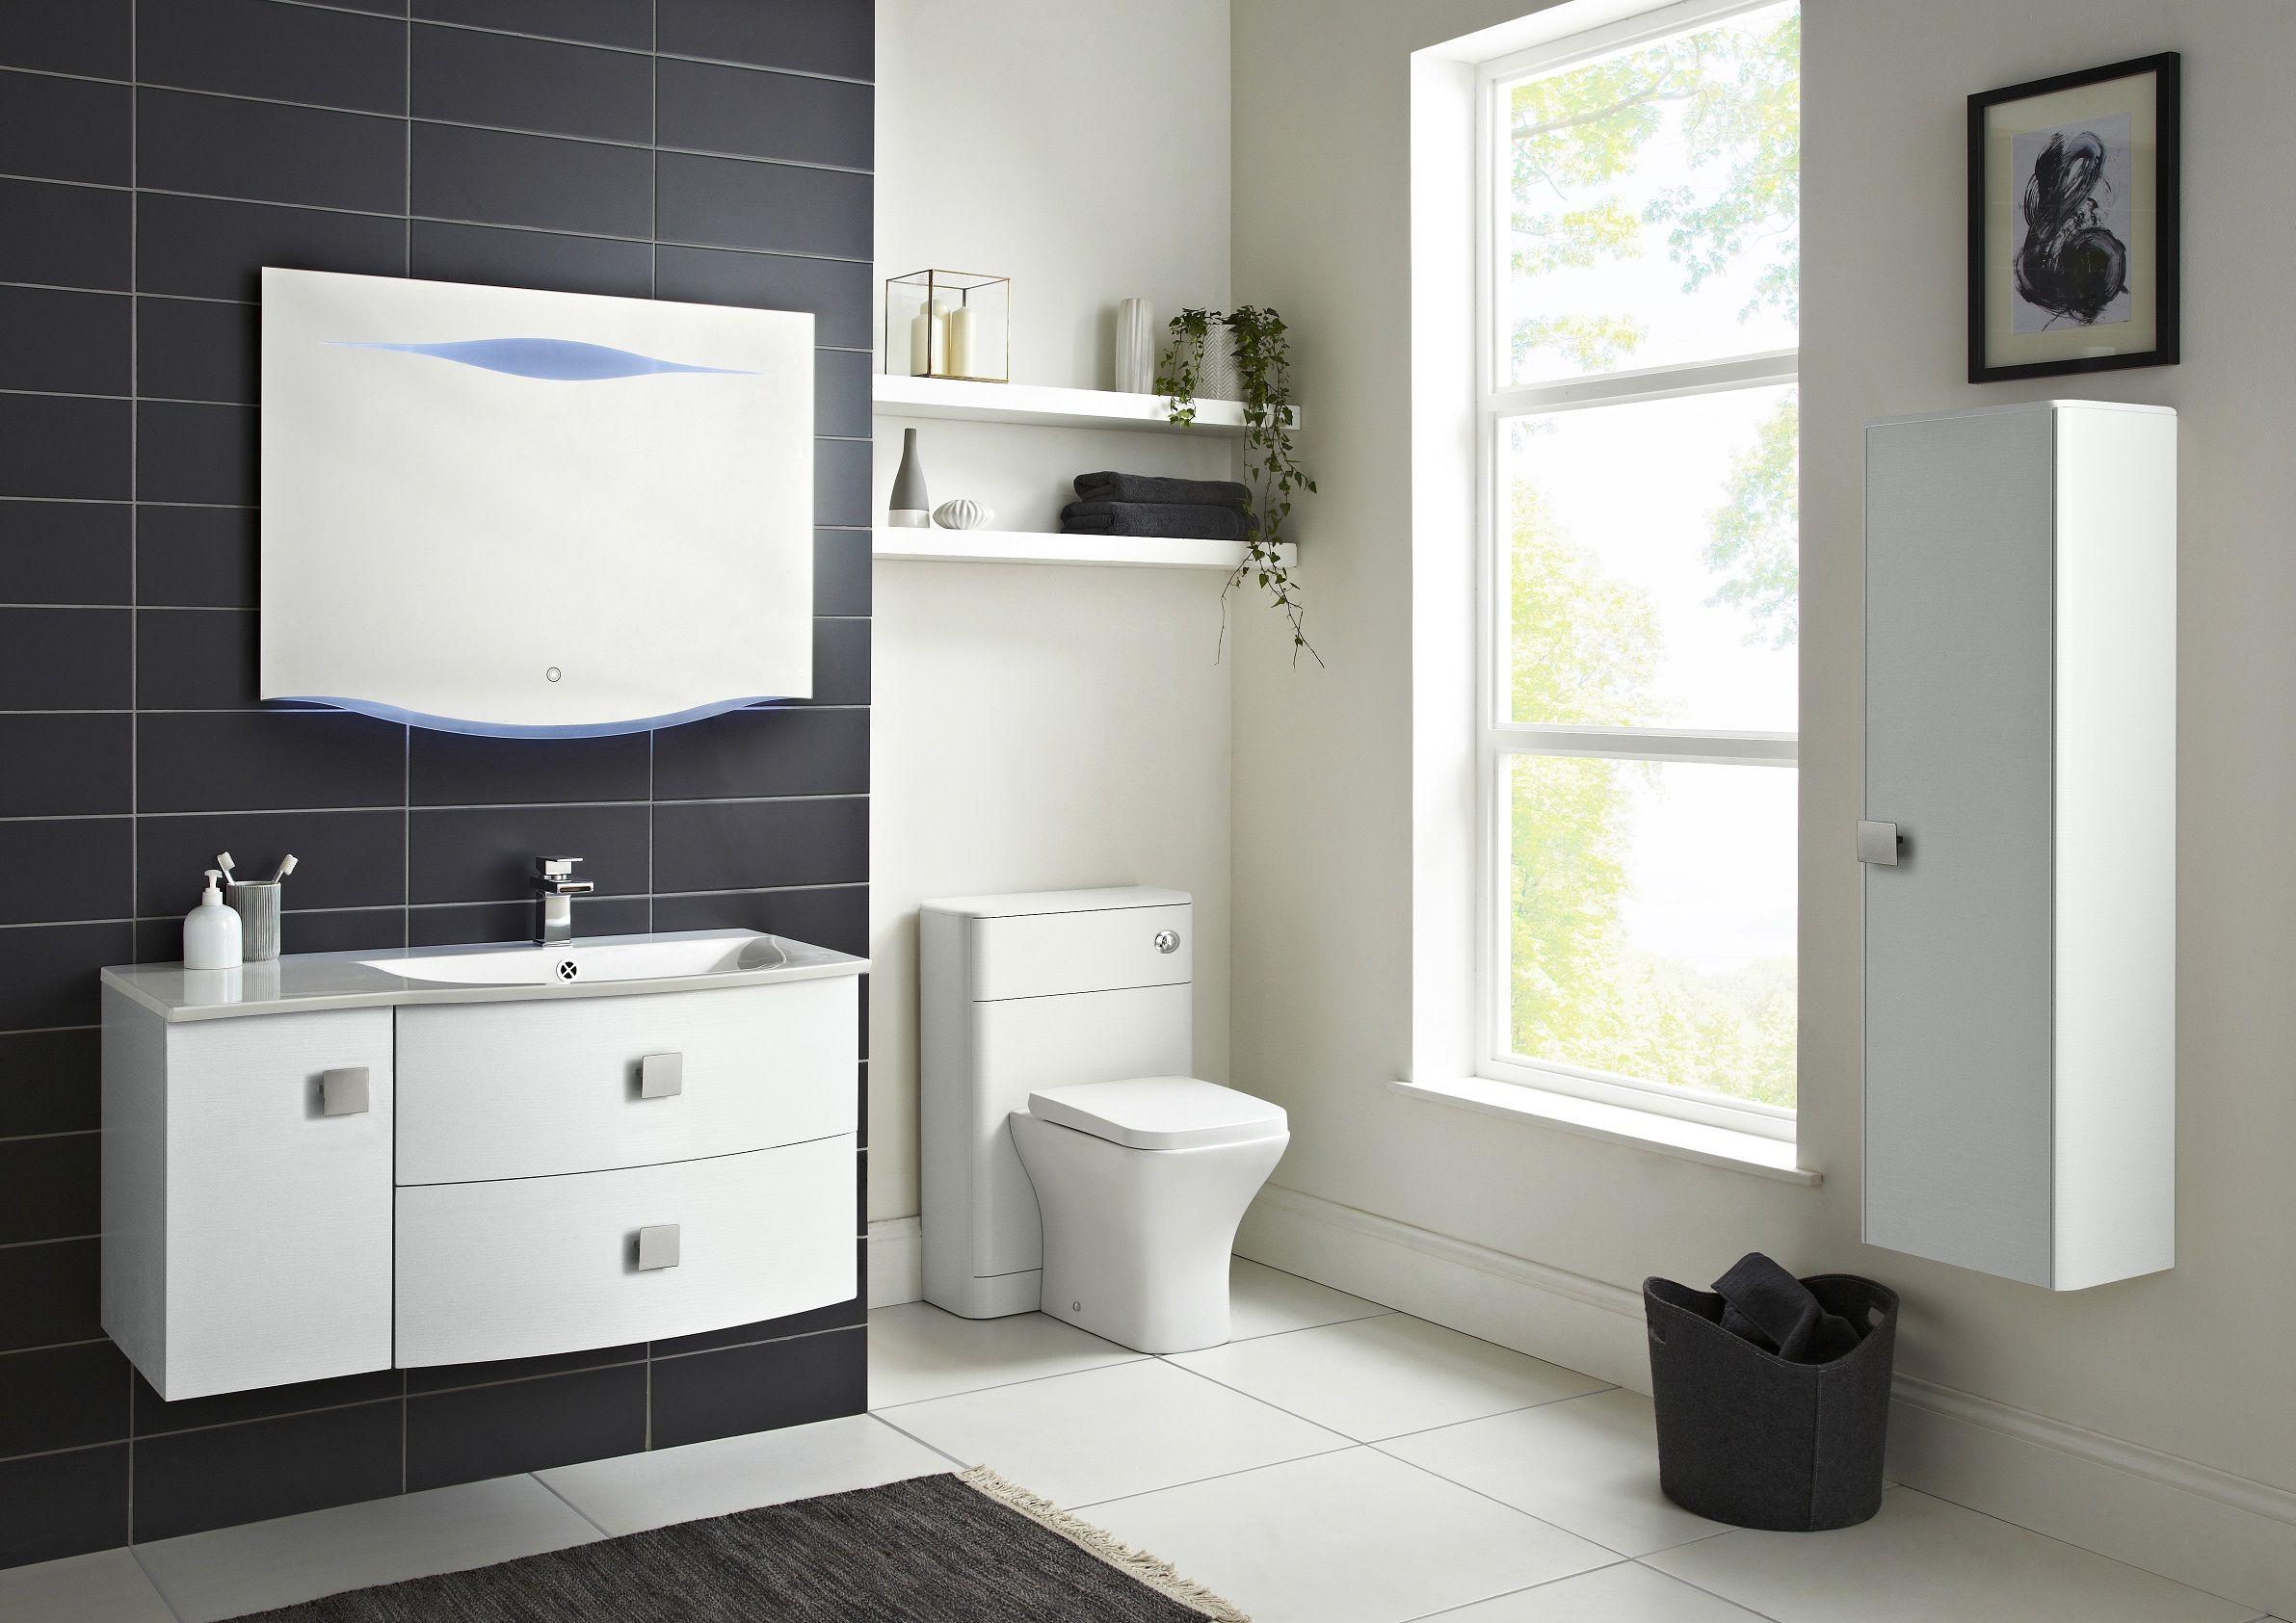 gloss gloss modular bathroom furniture collection. Sarenna White Gloss 1000mm Wall Hung Cabinet Design Modular Bathroom Furniture Collection G